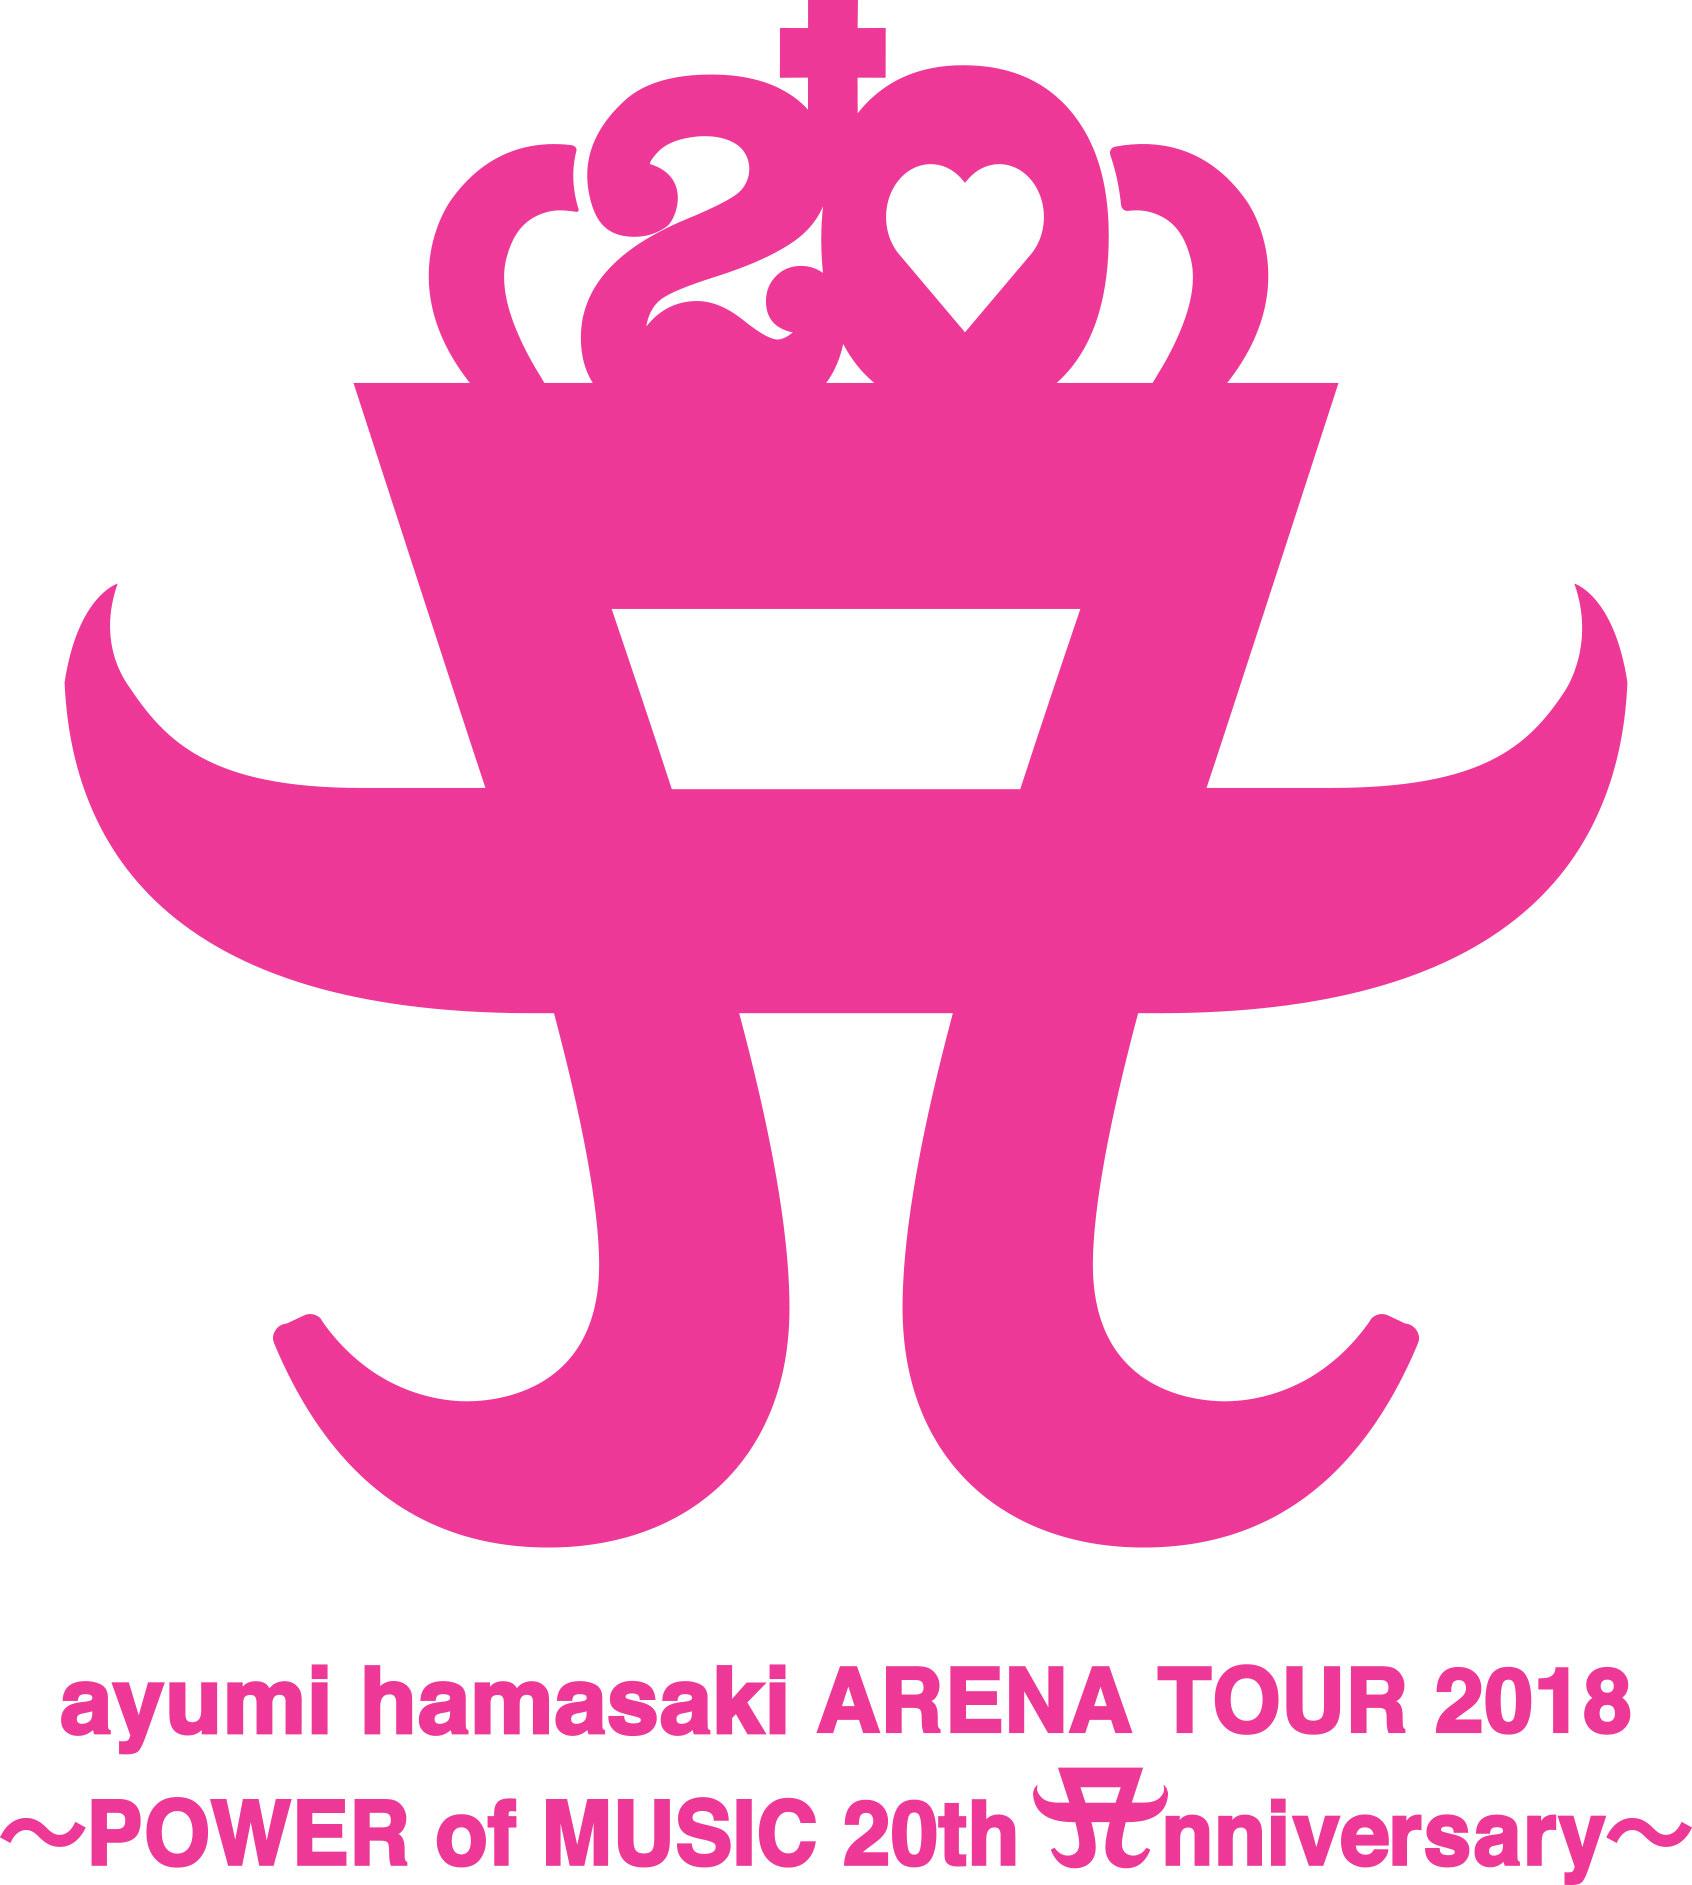 june 23rd miyagi ayumi hamasaki arena tour 2018 power of music